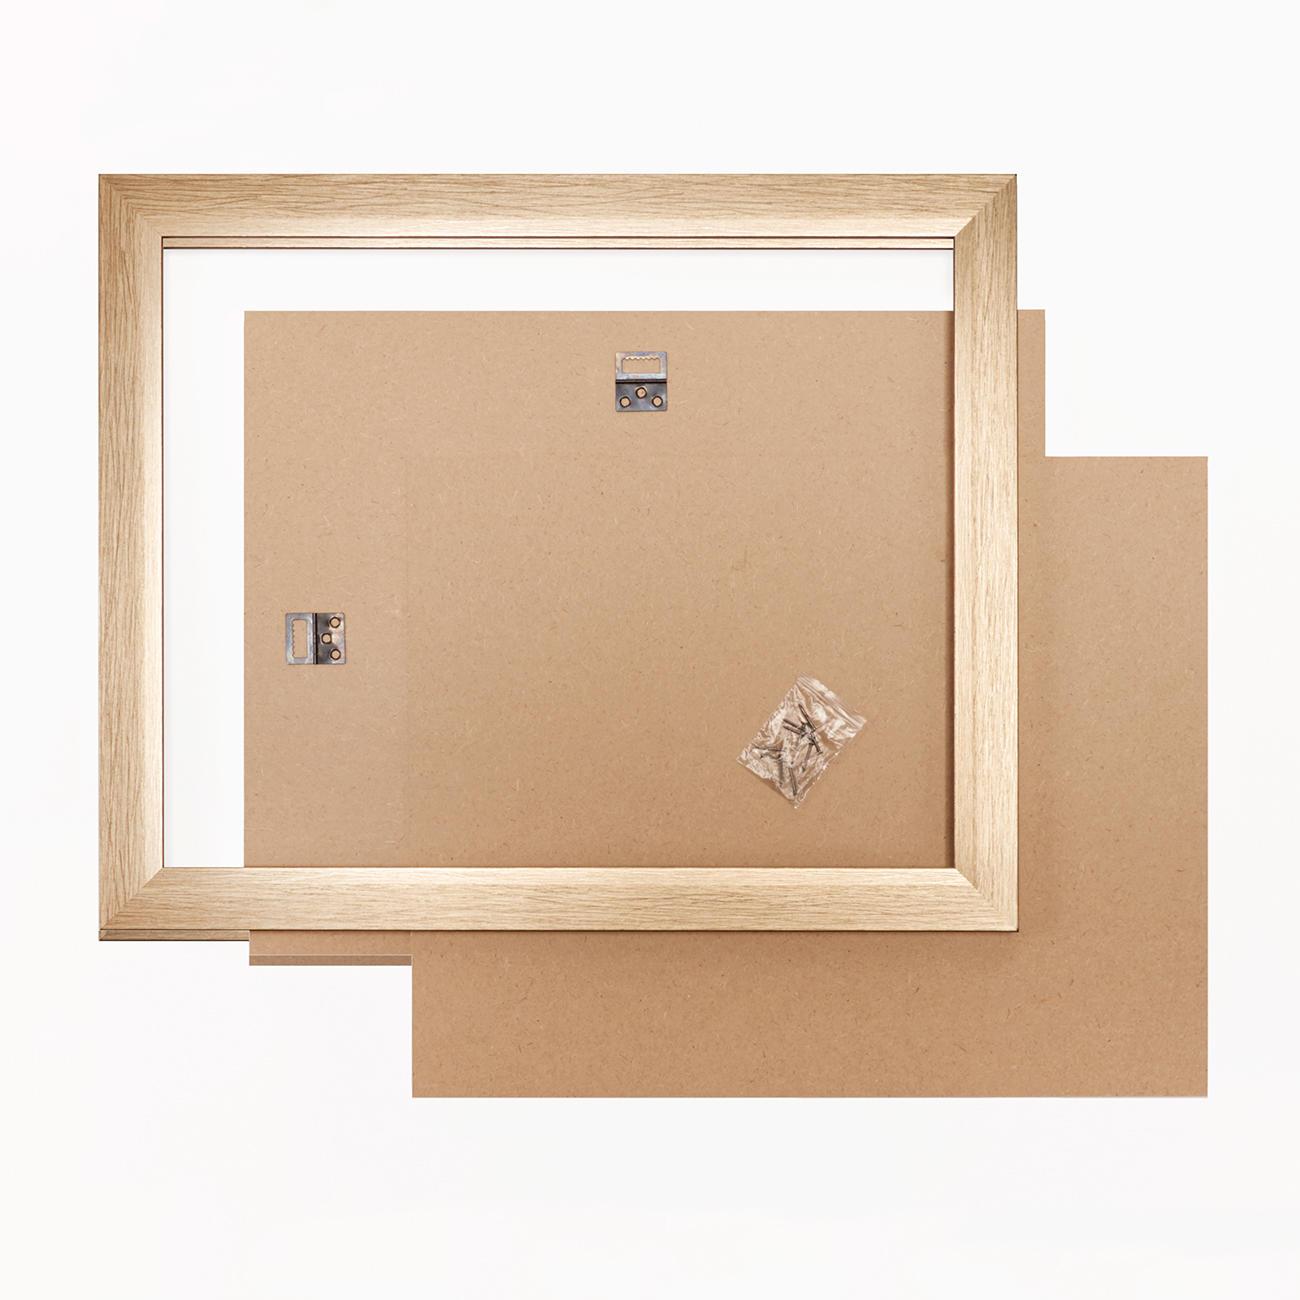 bilderrahmen blass goldfarben verschiedene gr ssen. Black Bedroom Furniture Sets. Home Design Ideas